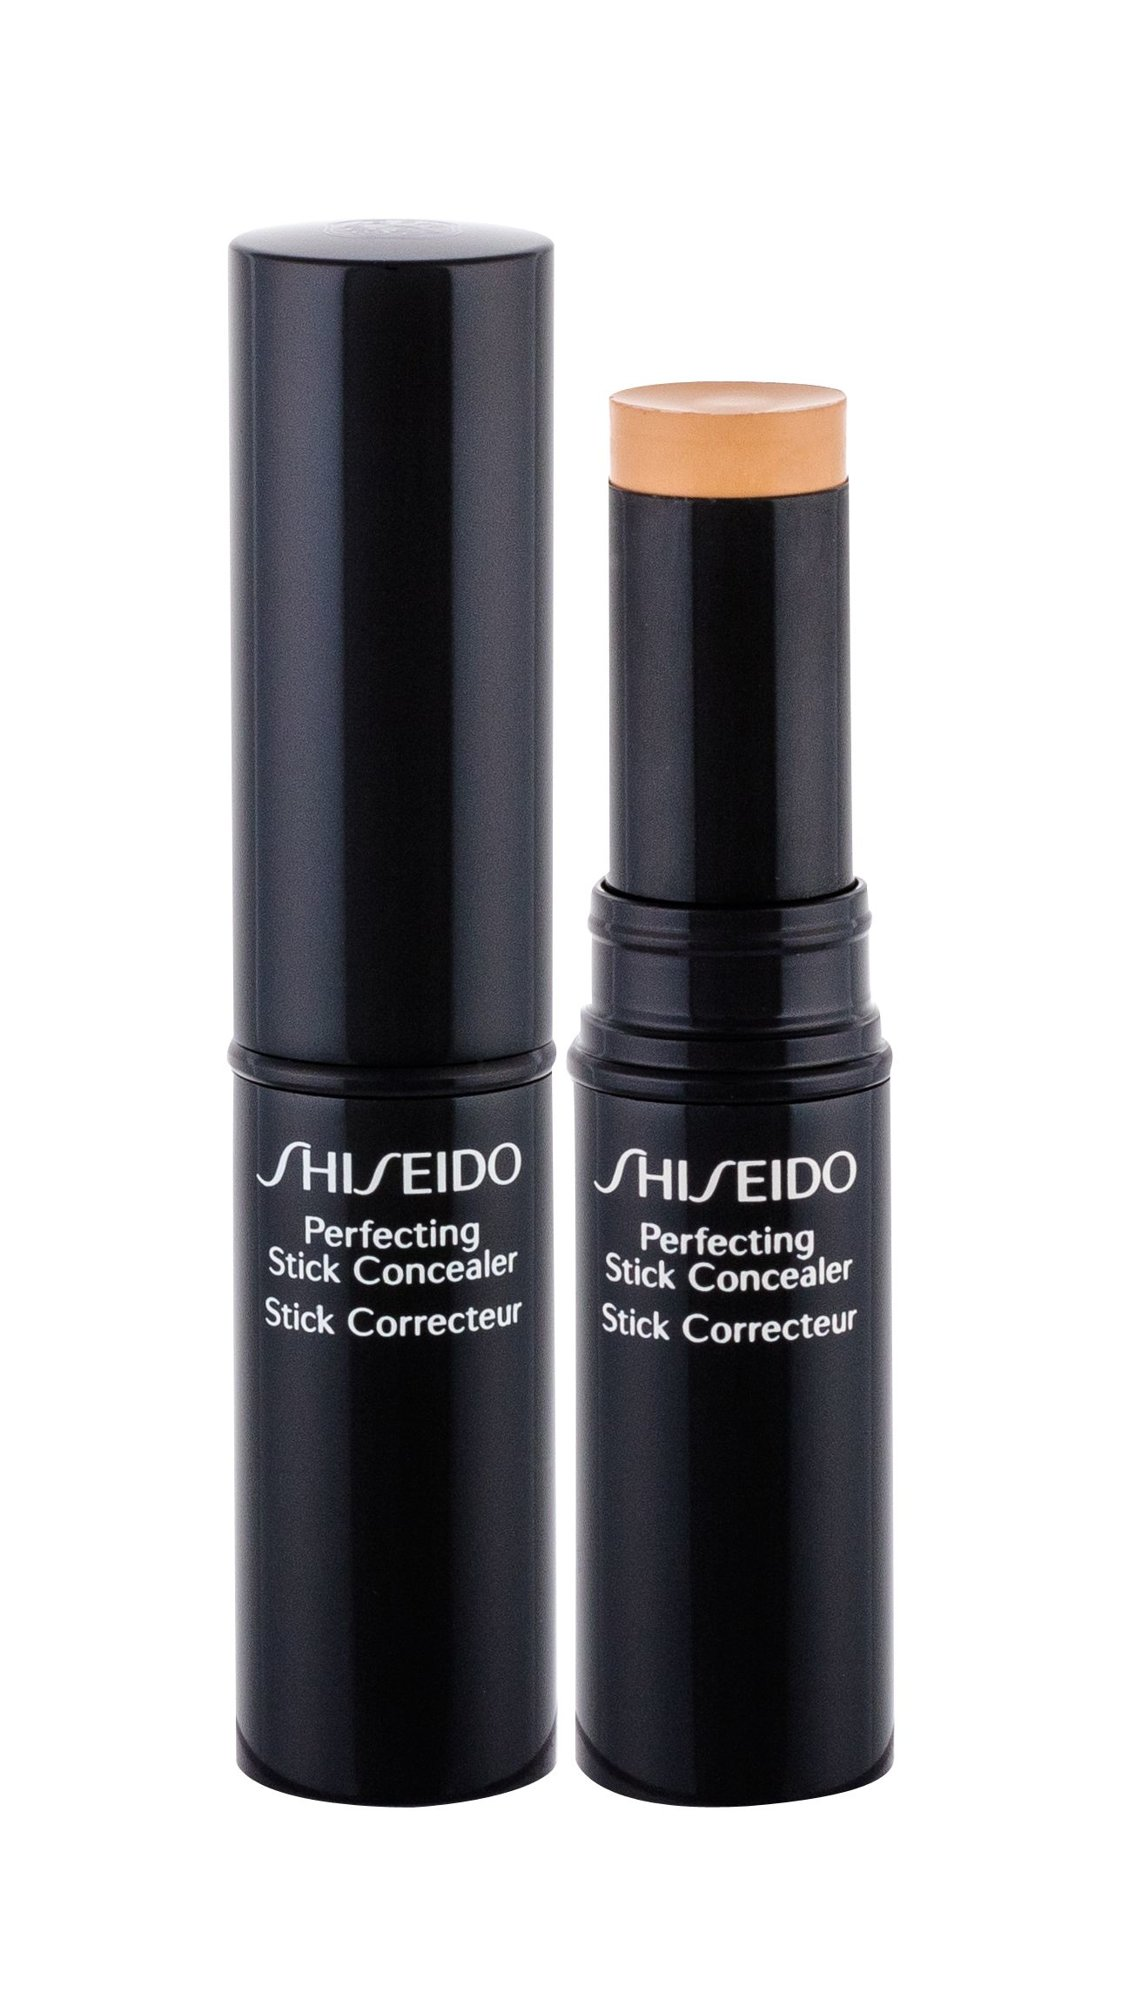 Shiseido Perfecting Stick Concealer Corrector 5ml 33 Natural